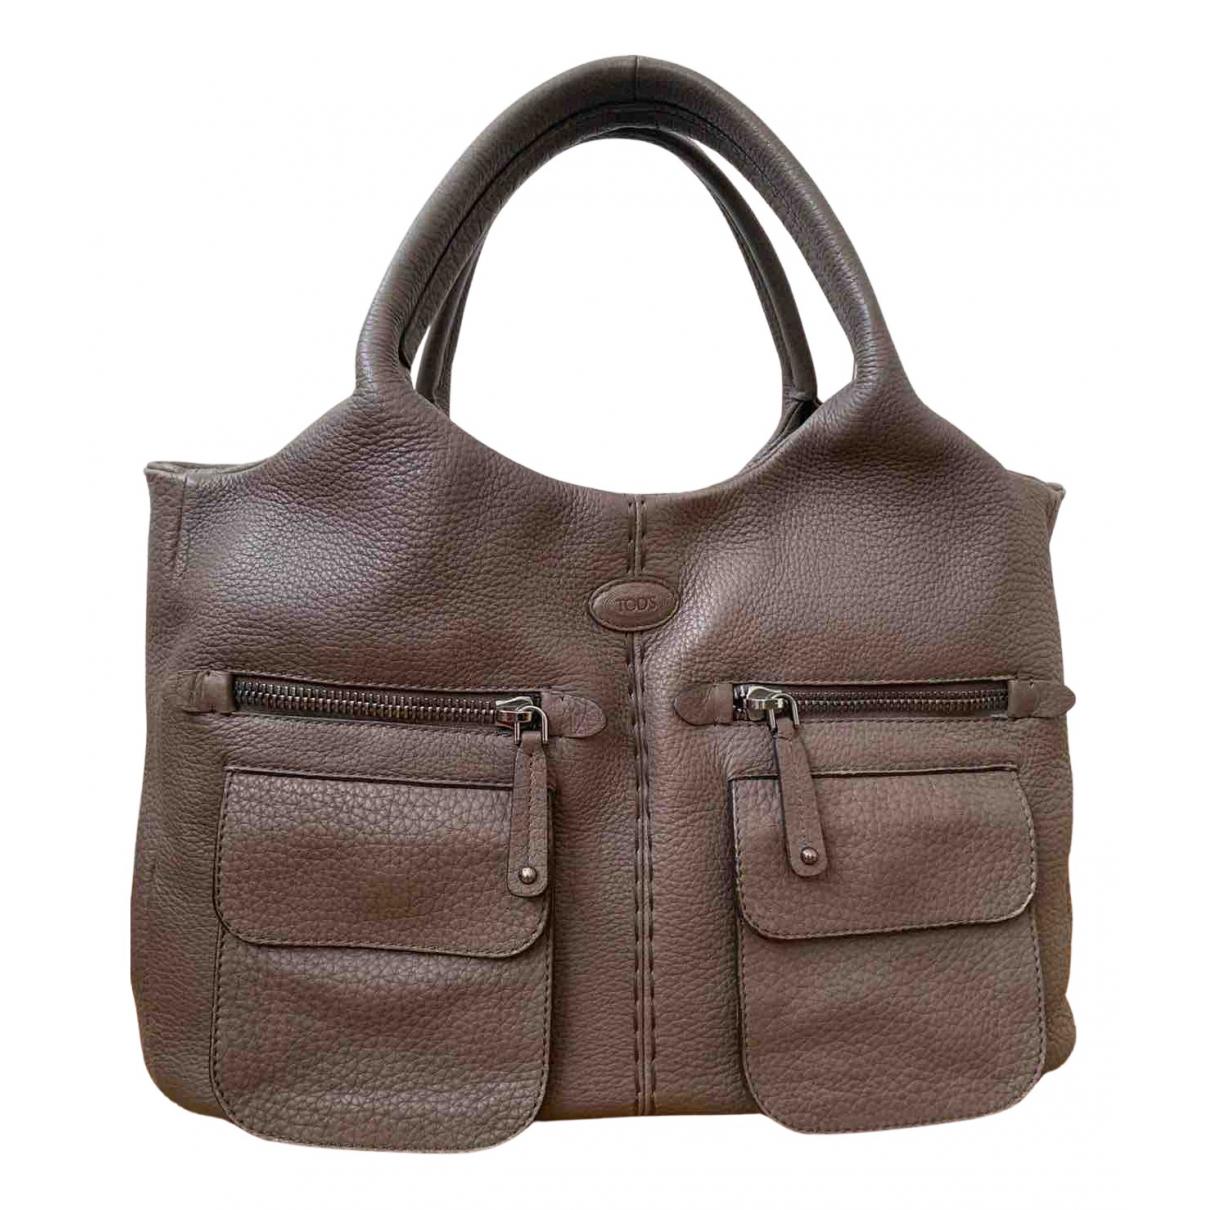 Tod's N Brown Leather handbag for Women N